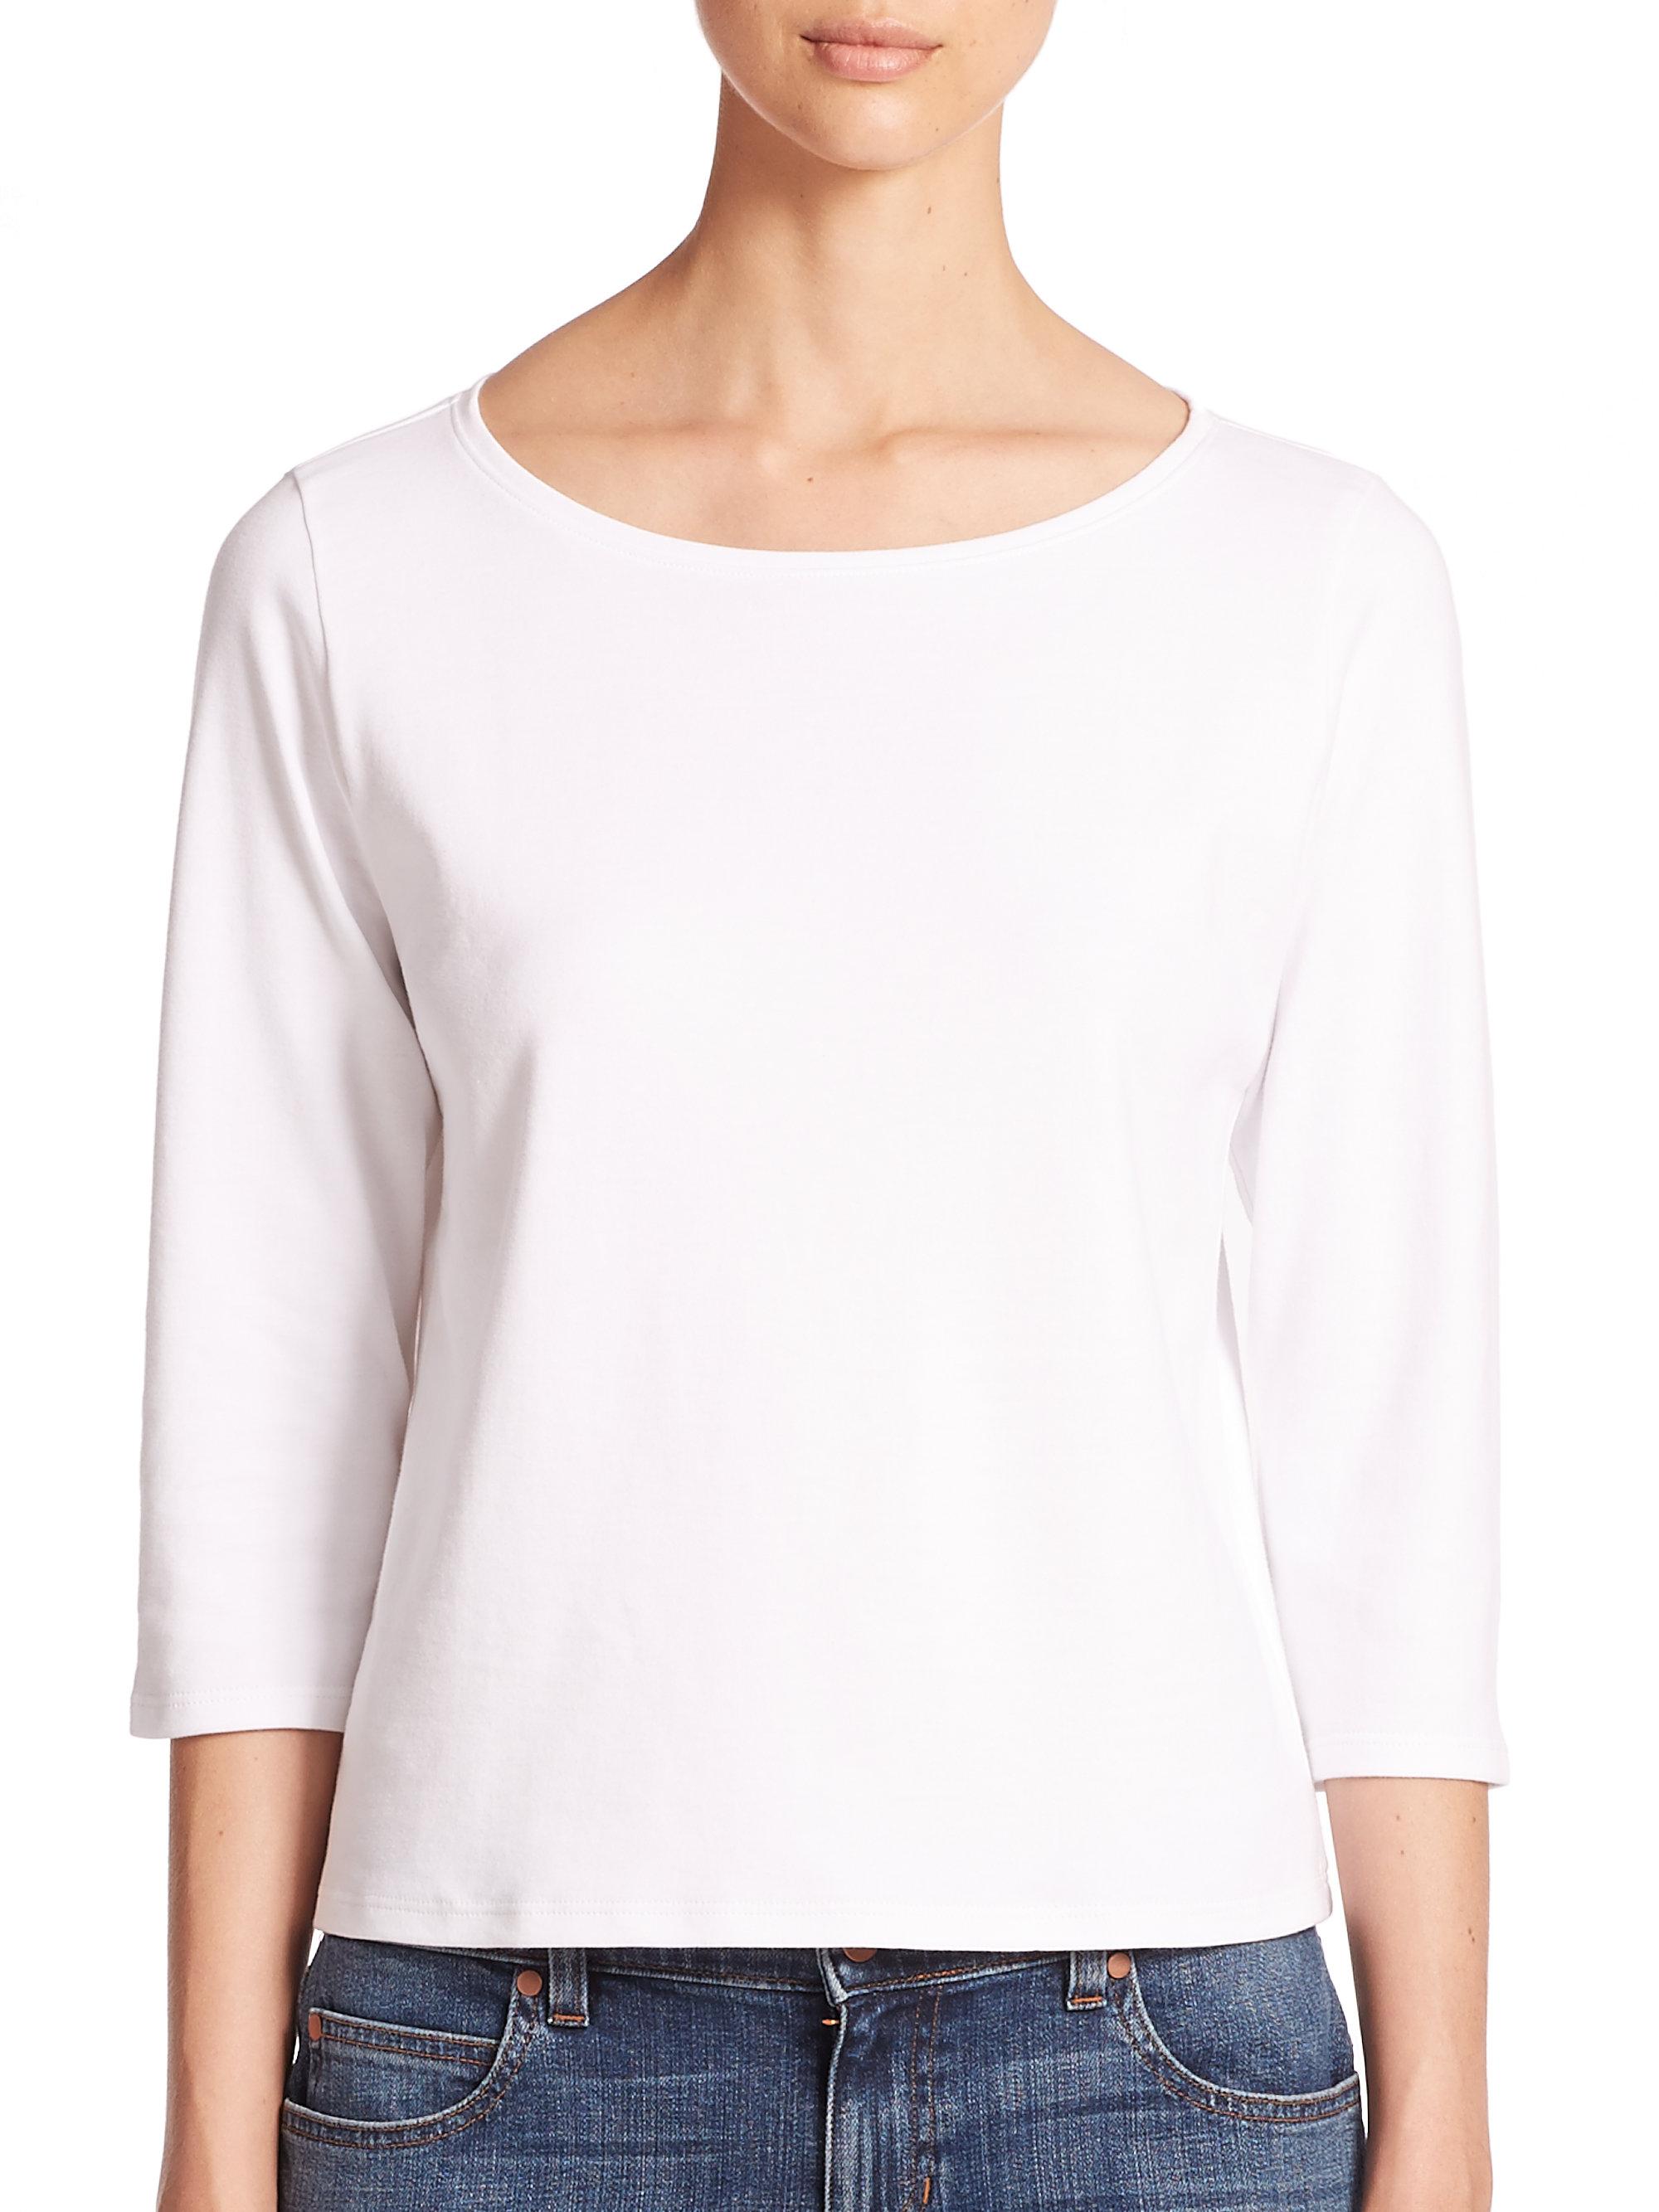 Eileen fisher ballet neck organic cotton tee in white lyst for Eileen fisher organic cotton t shirt